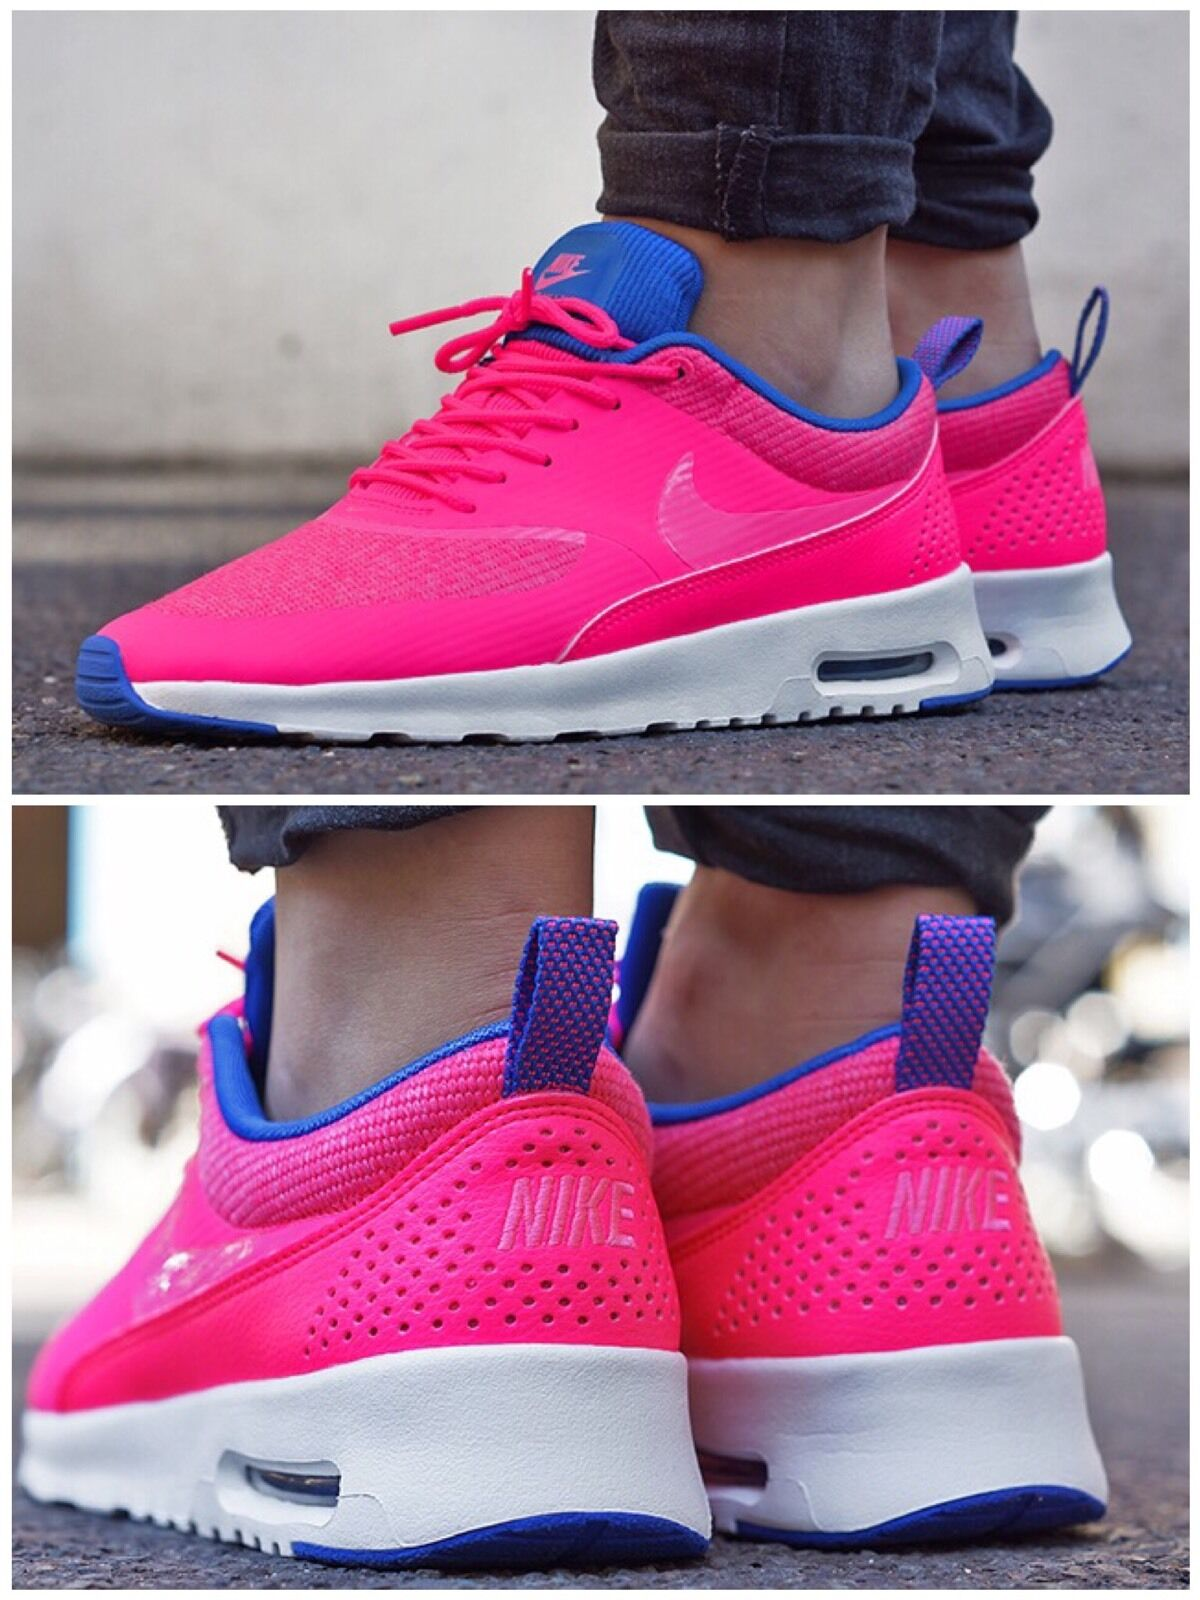 Nike Air Max Thea Premium.  4 616723 601. U.K. Größe 4  ee8f03